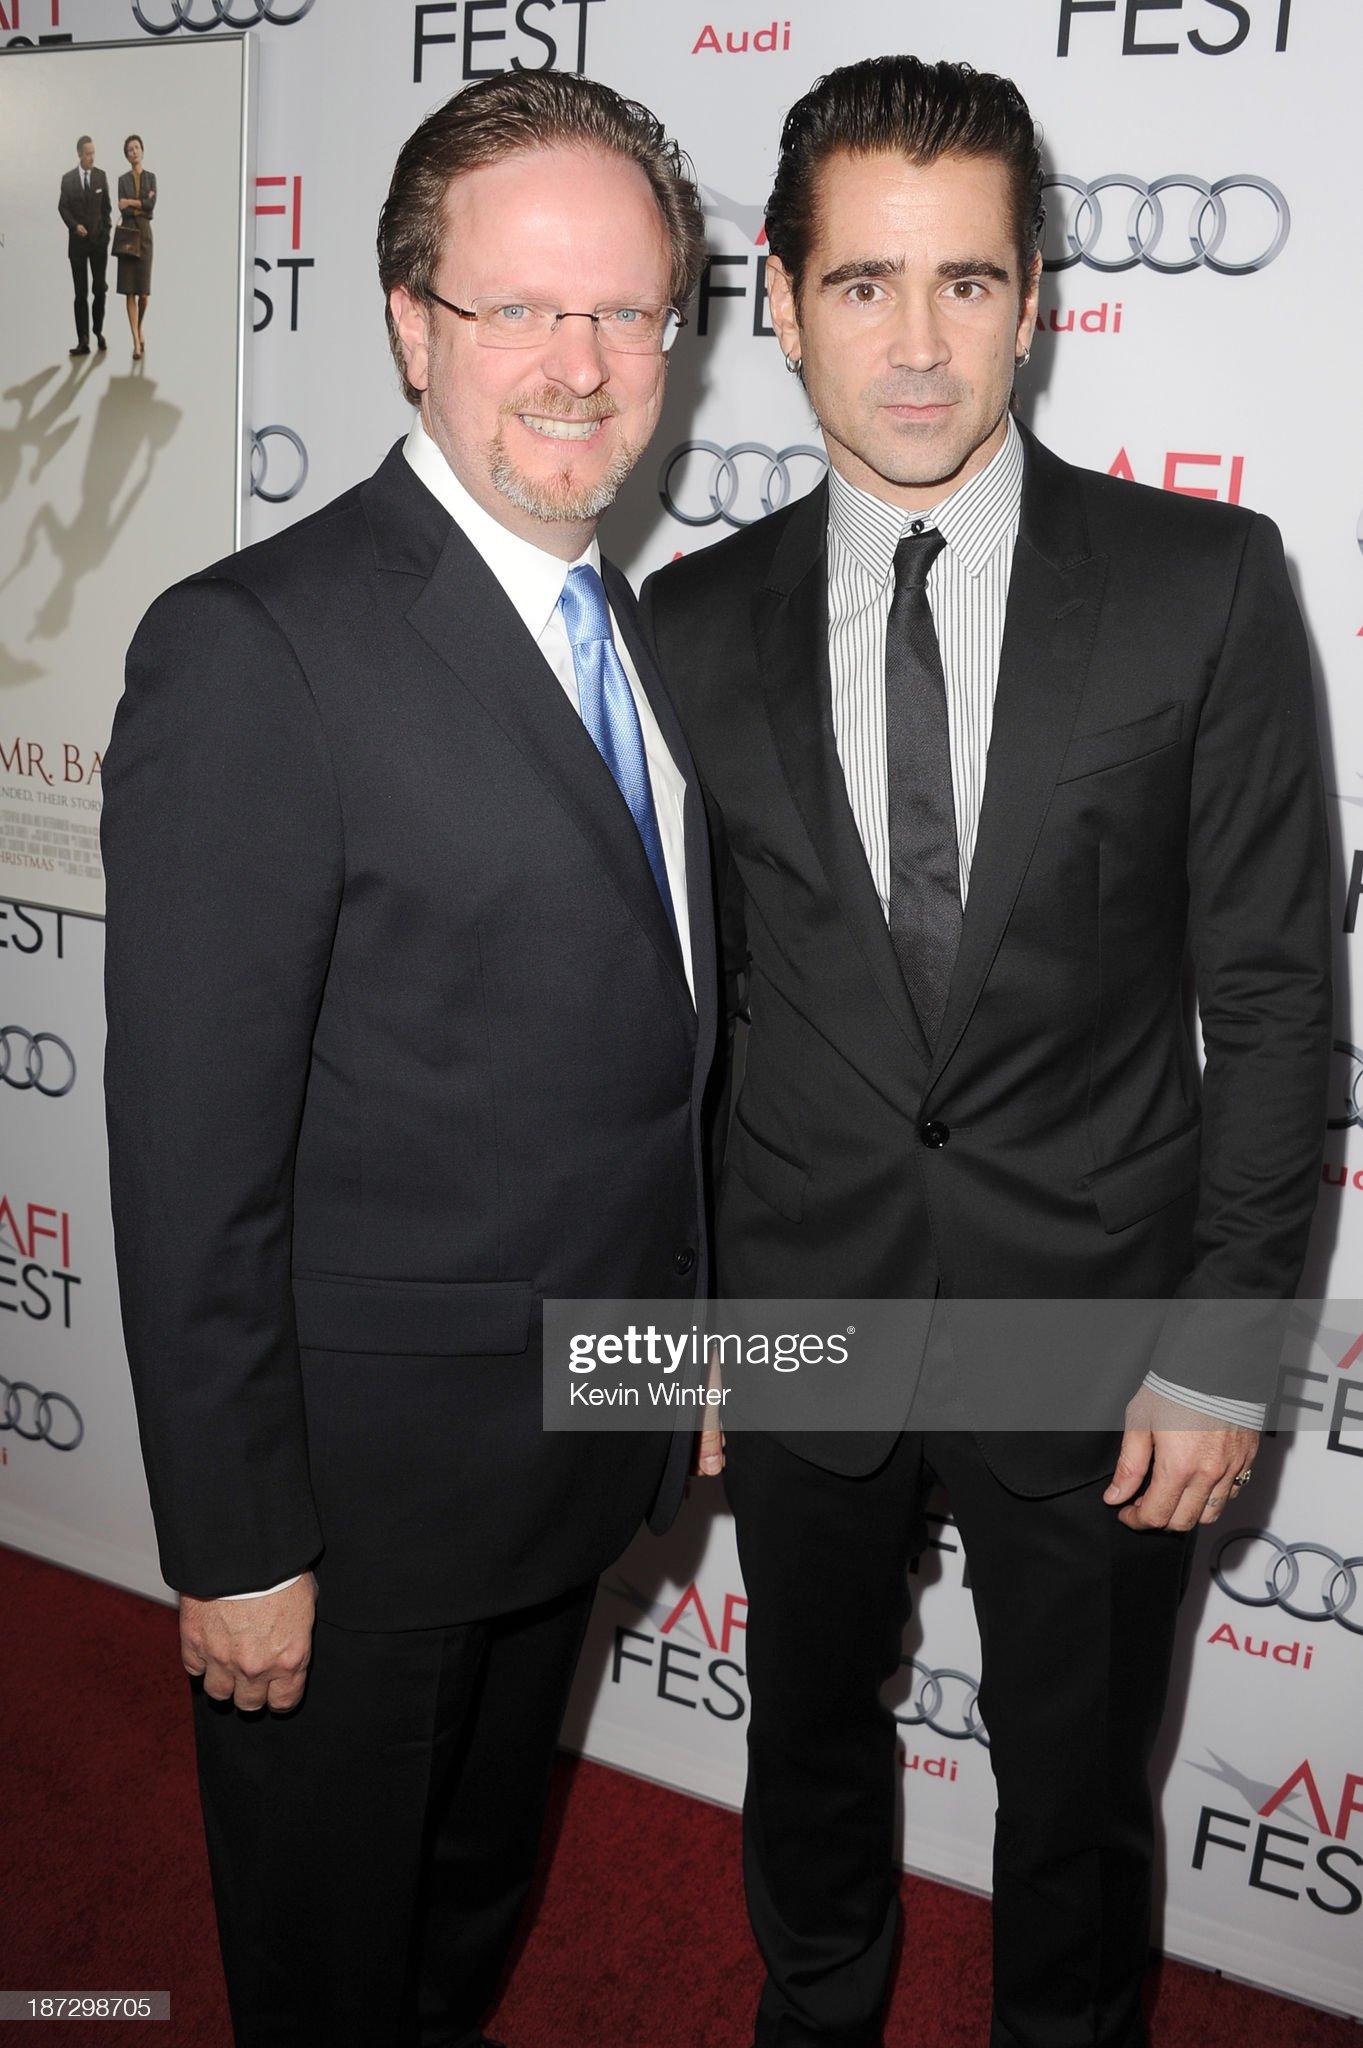 ¿Cuánto mide Colin Farrell? - Altura - Real height President-ceo-bob-gazzale-and-actor-colin-farrell-attend-the-premiere-picture-id187298705?s=2048x2048